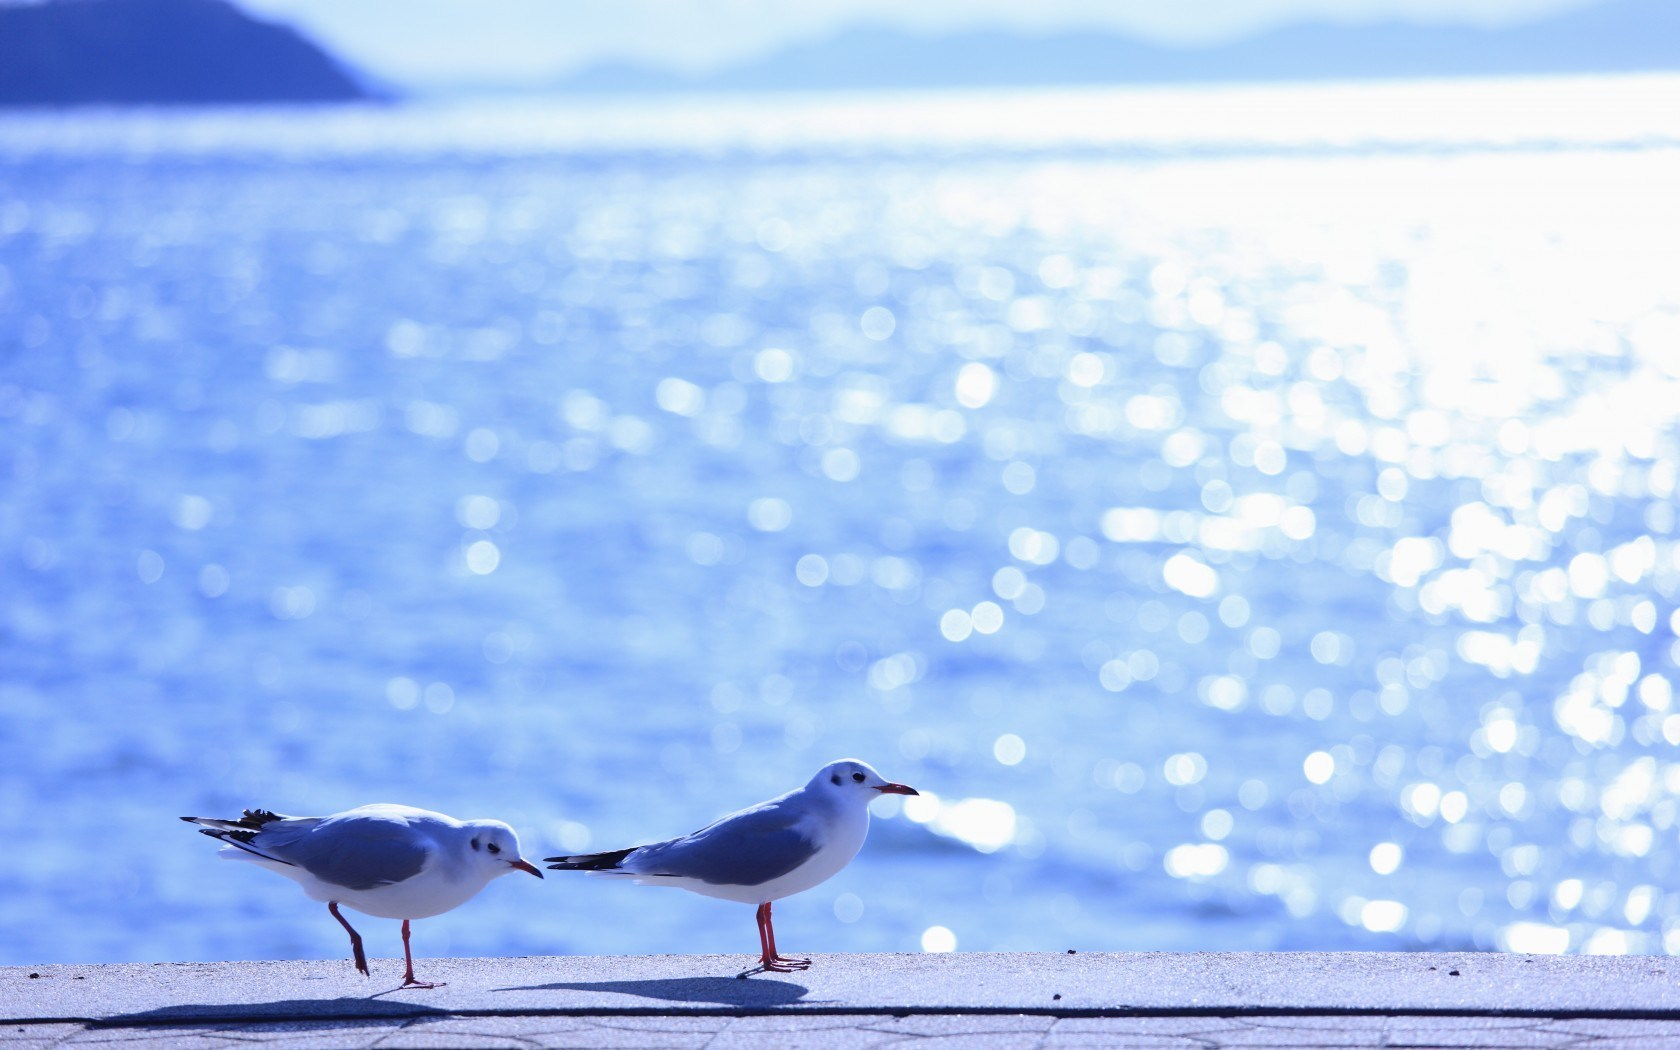 Gulls Birds Sea Waves Summer